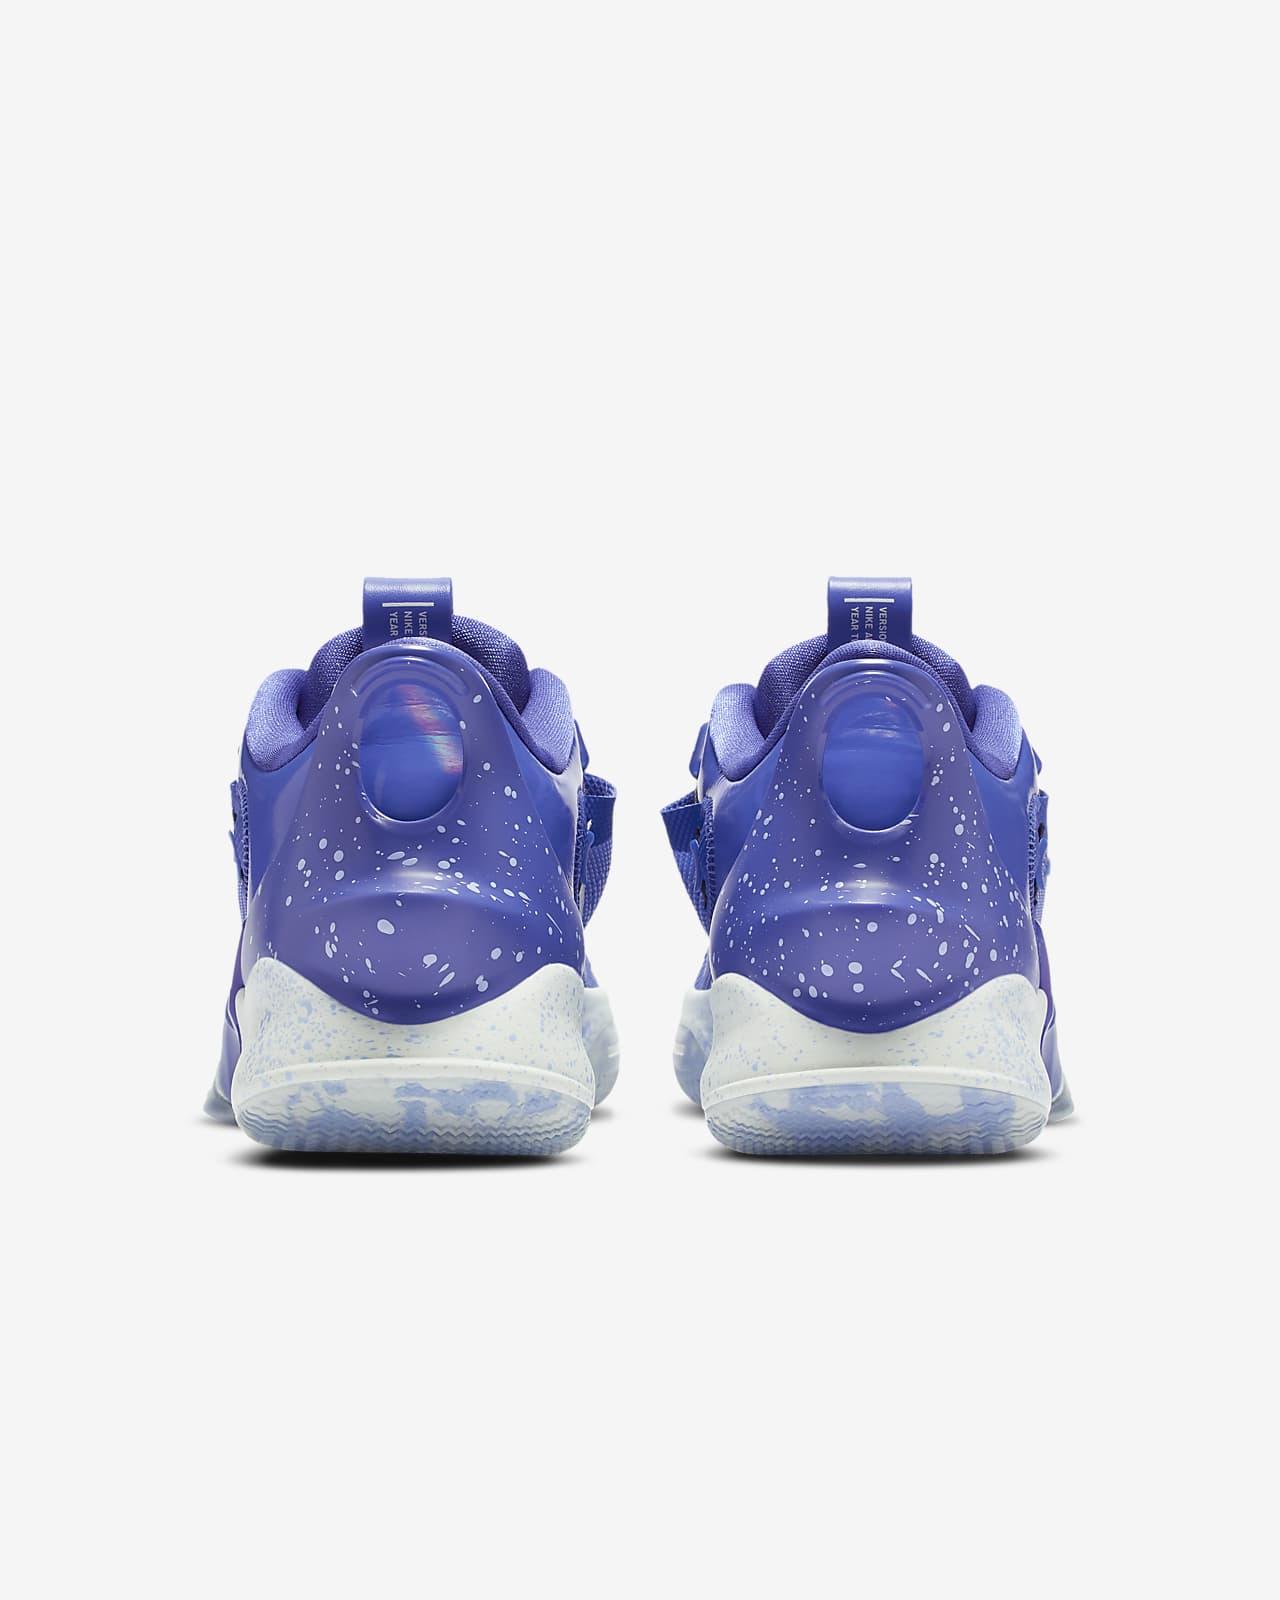 Nike Adapt BB 2.0 Basketball Shoe. Nike SG